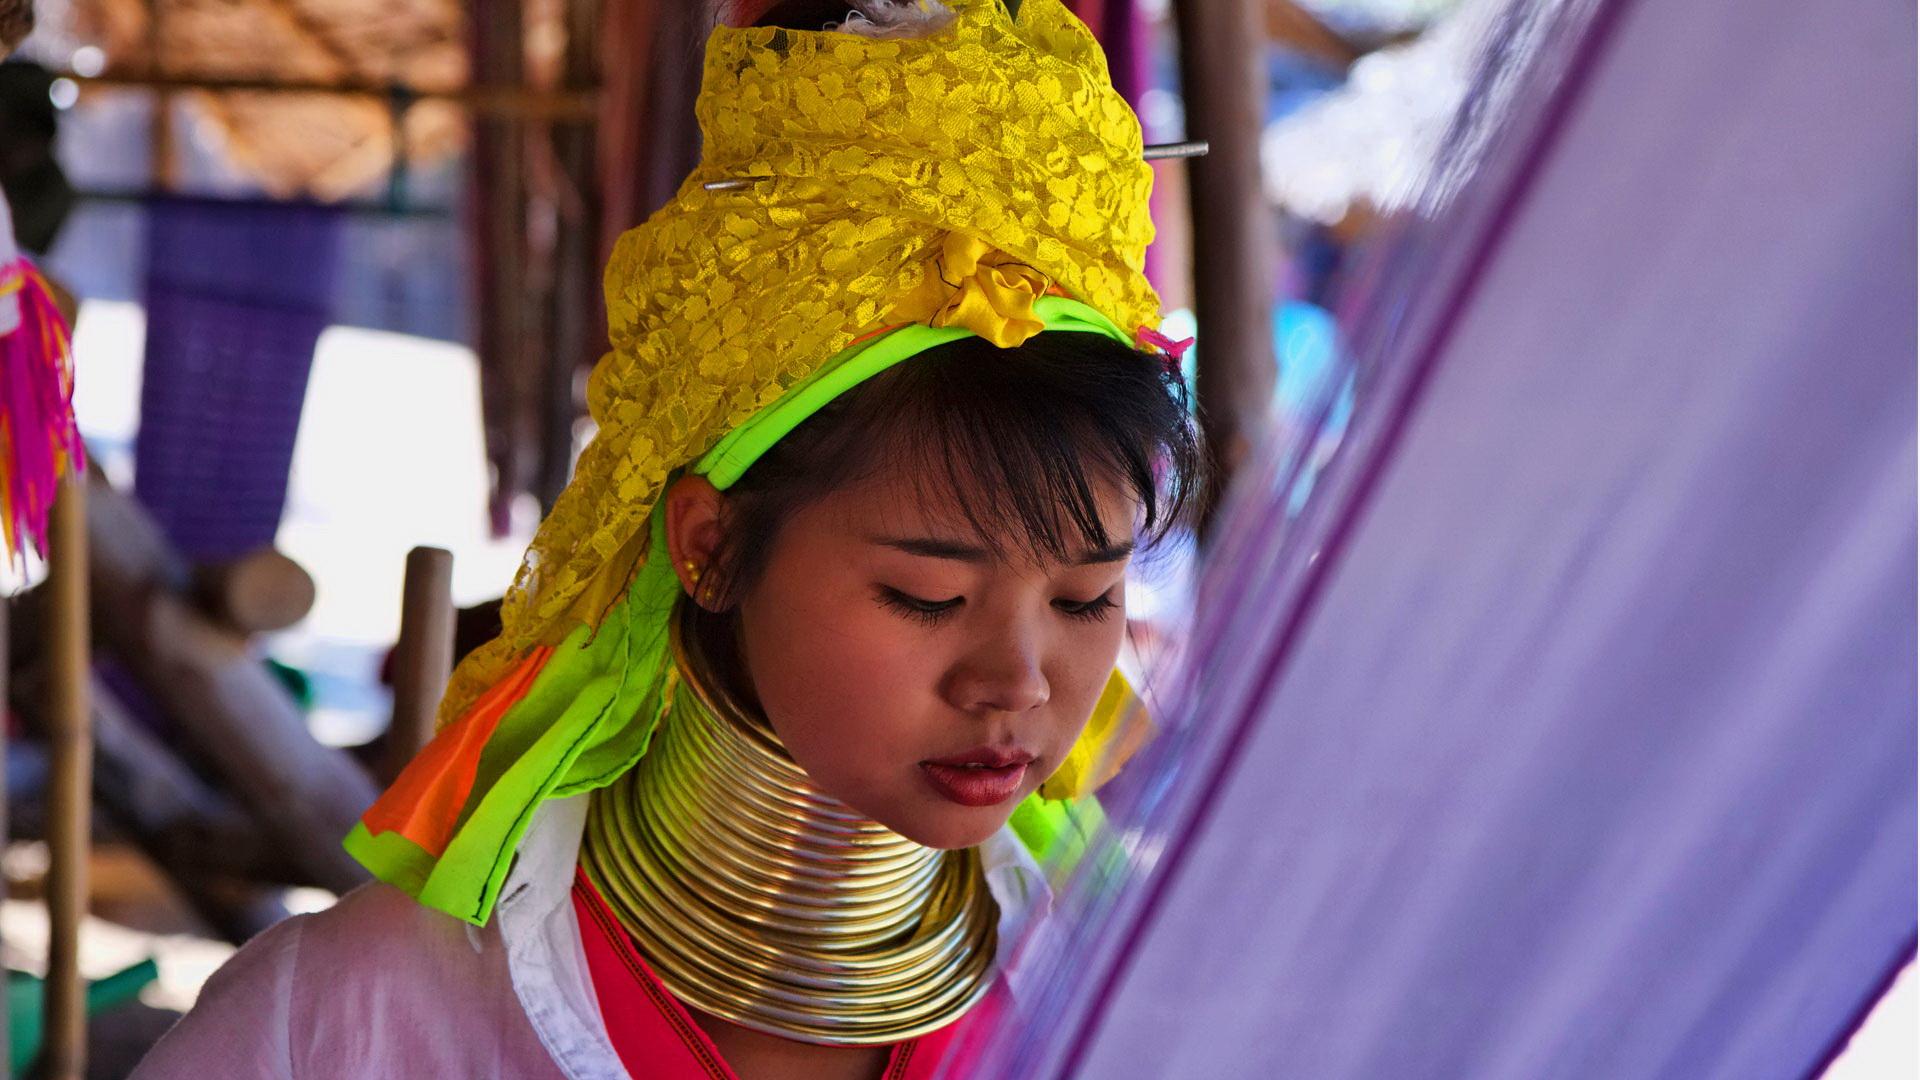 https://fotos.hellotrip.es/tailandia/Tailandia_Chiang_Rai_Mae_Hong_Son_mujeres_jirafa.jpg